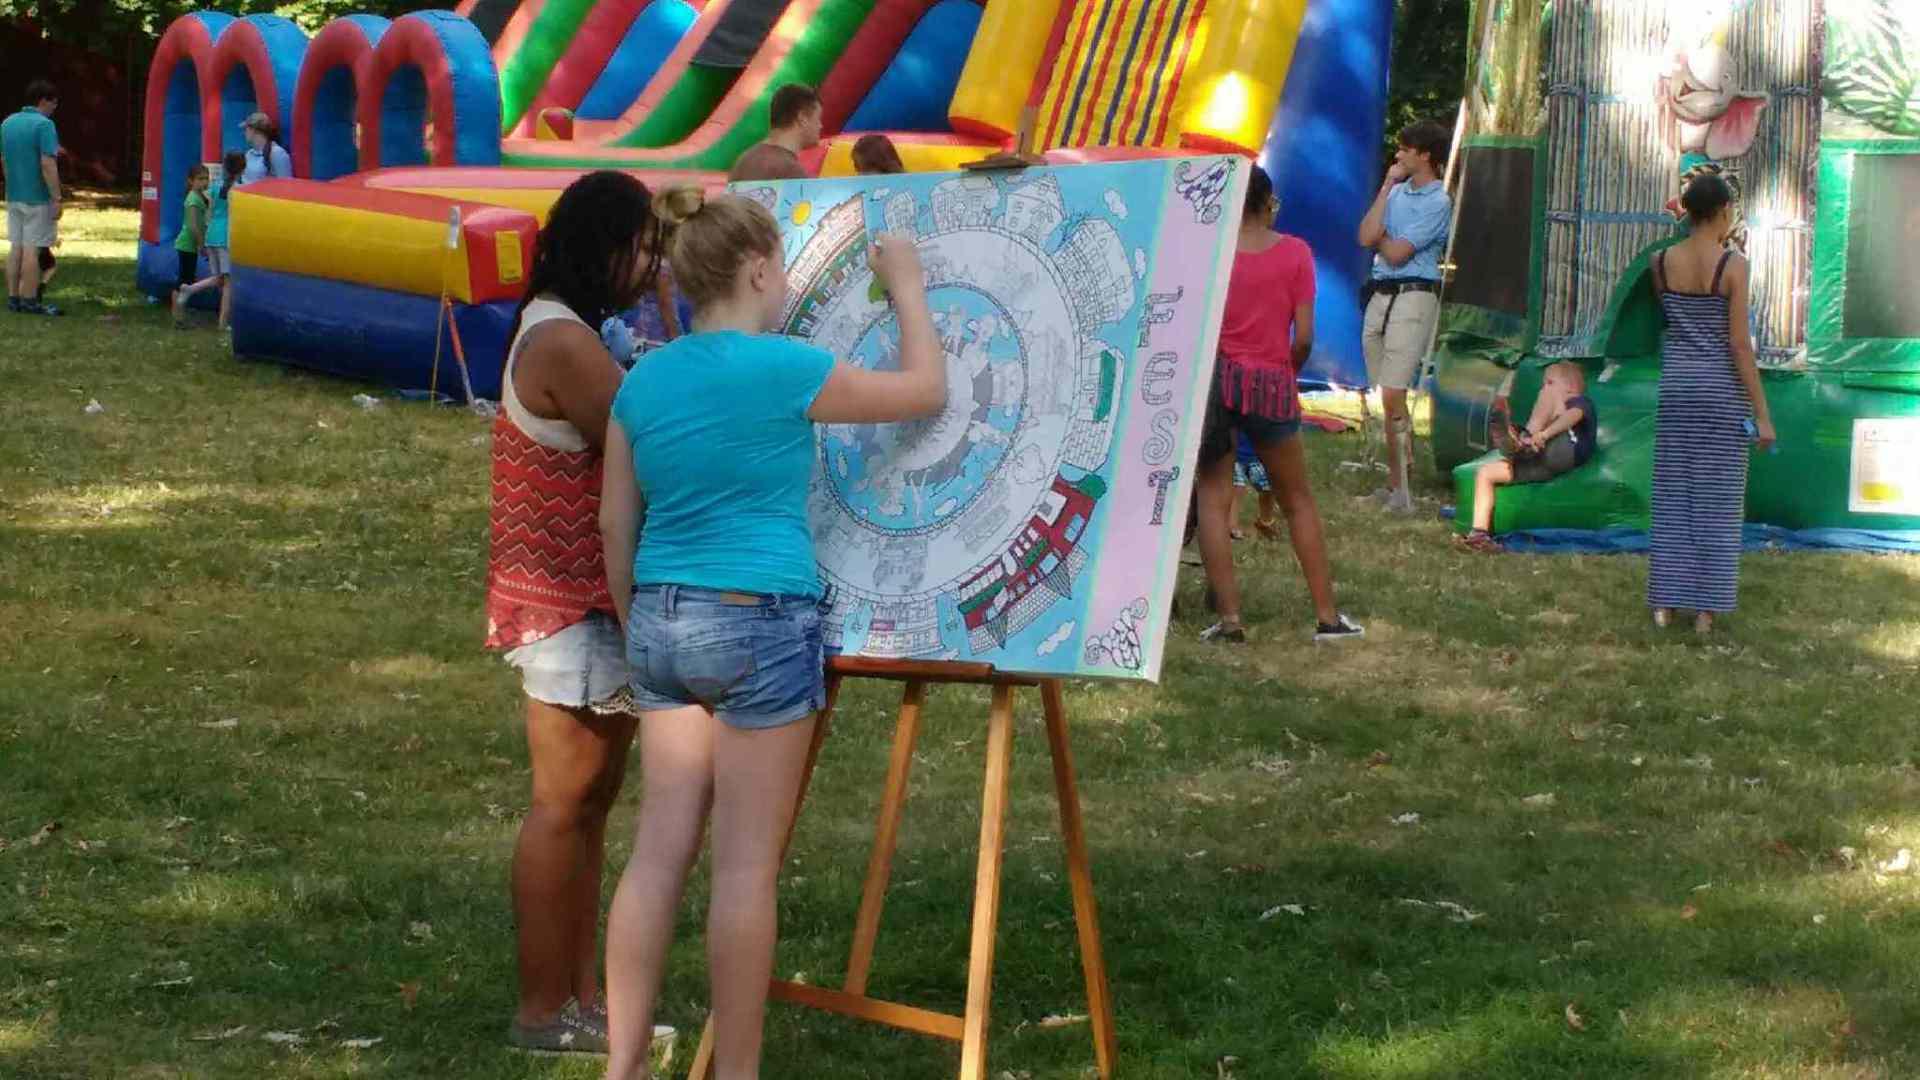 Our 3 feet by 4 feet Park Ave Fest Canvas